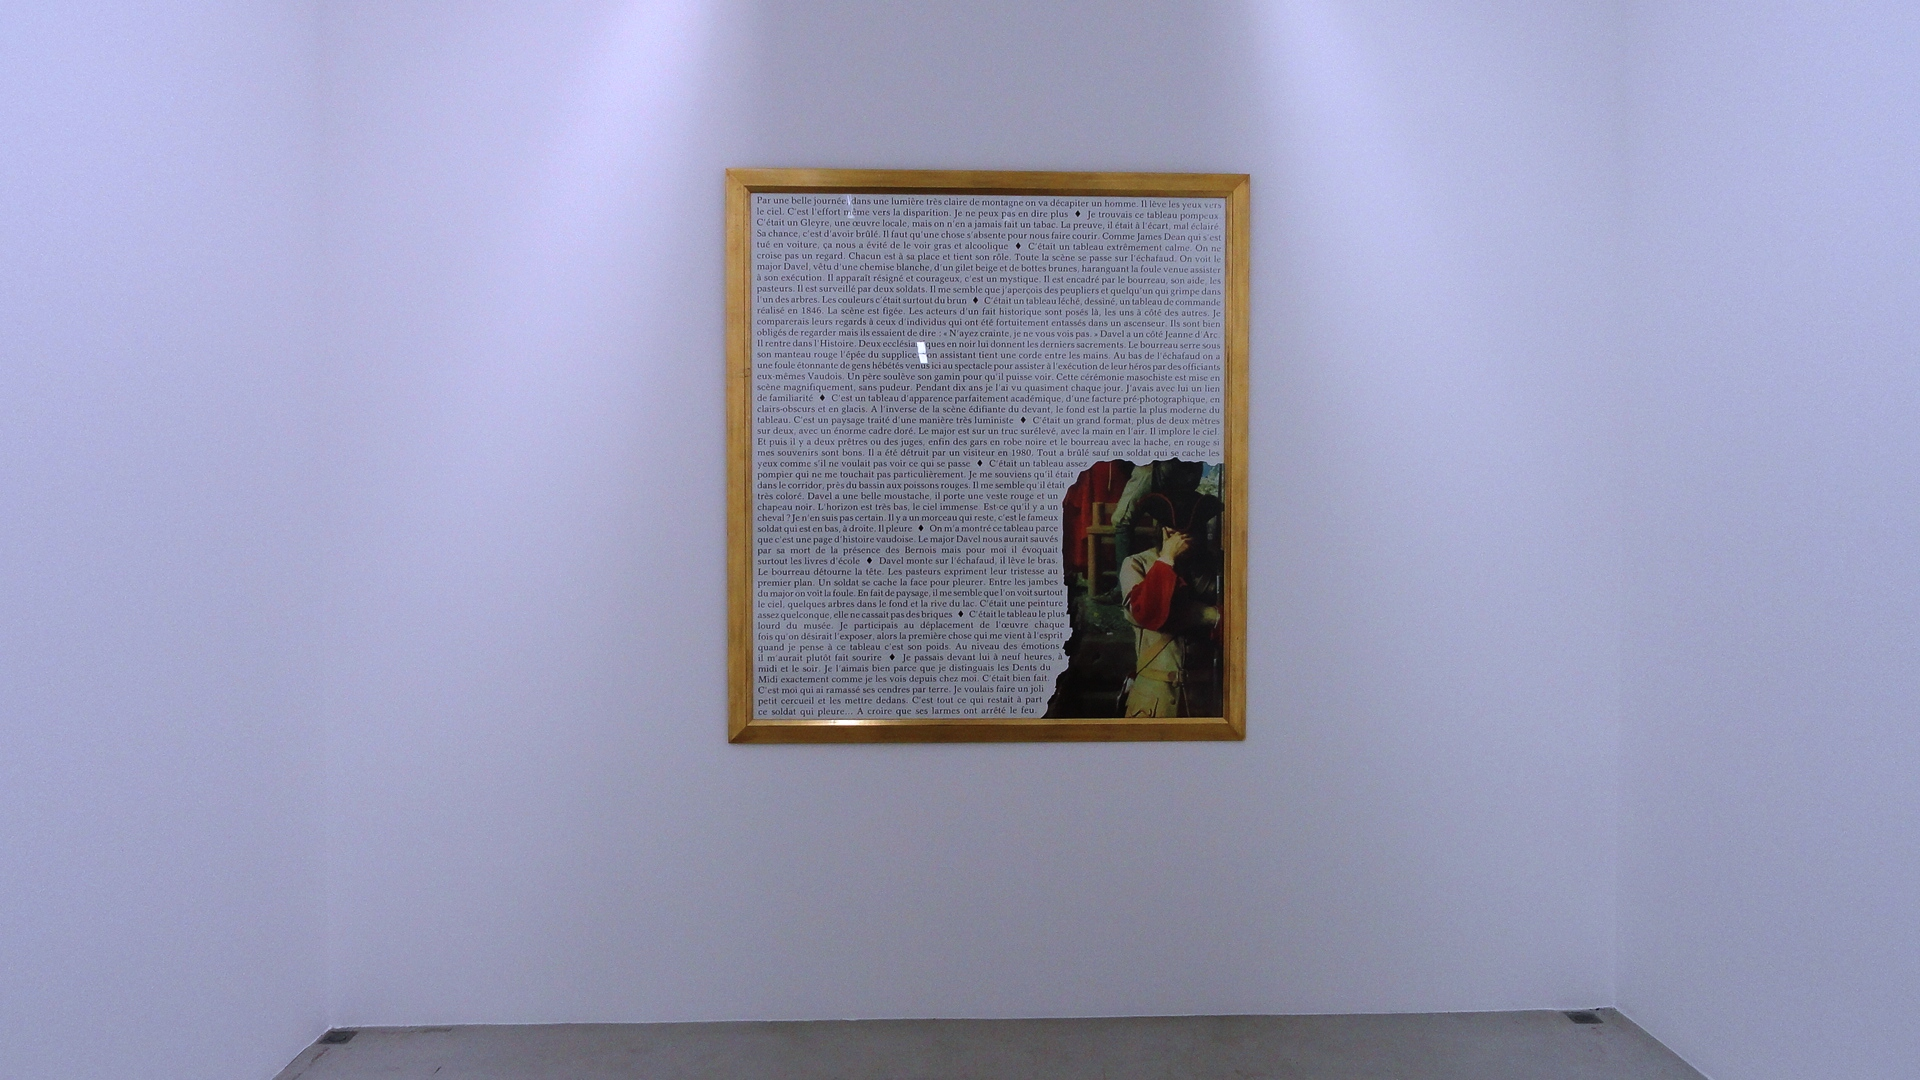 Galerie Perrotin - Sophie Calle, Dérobés - Major Davel